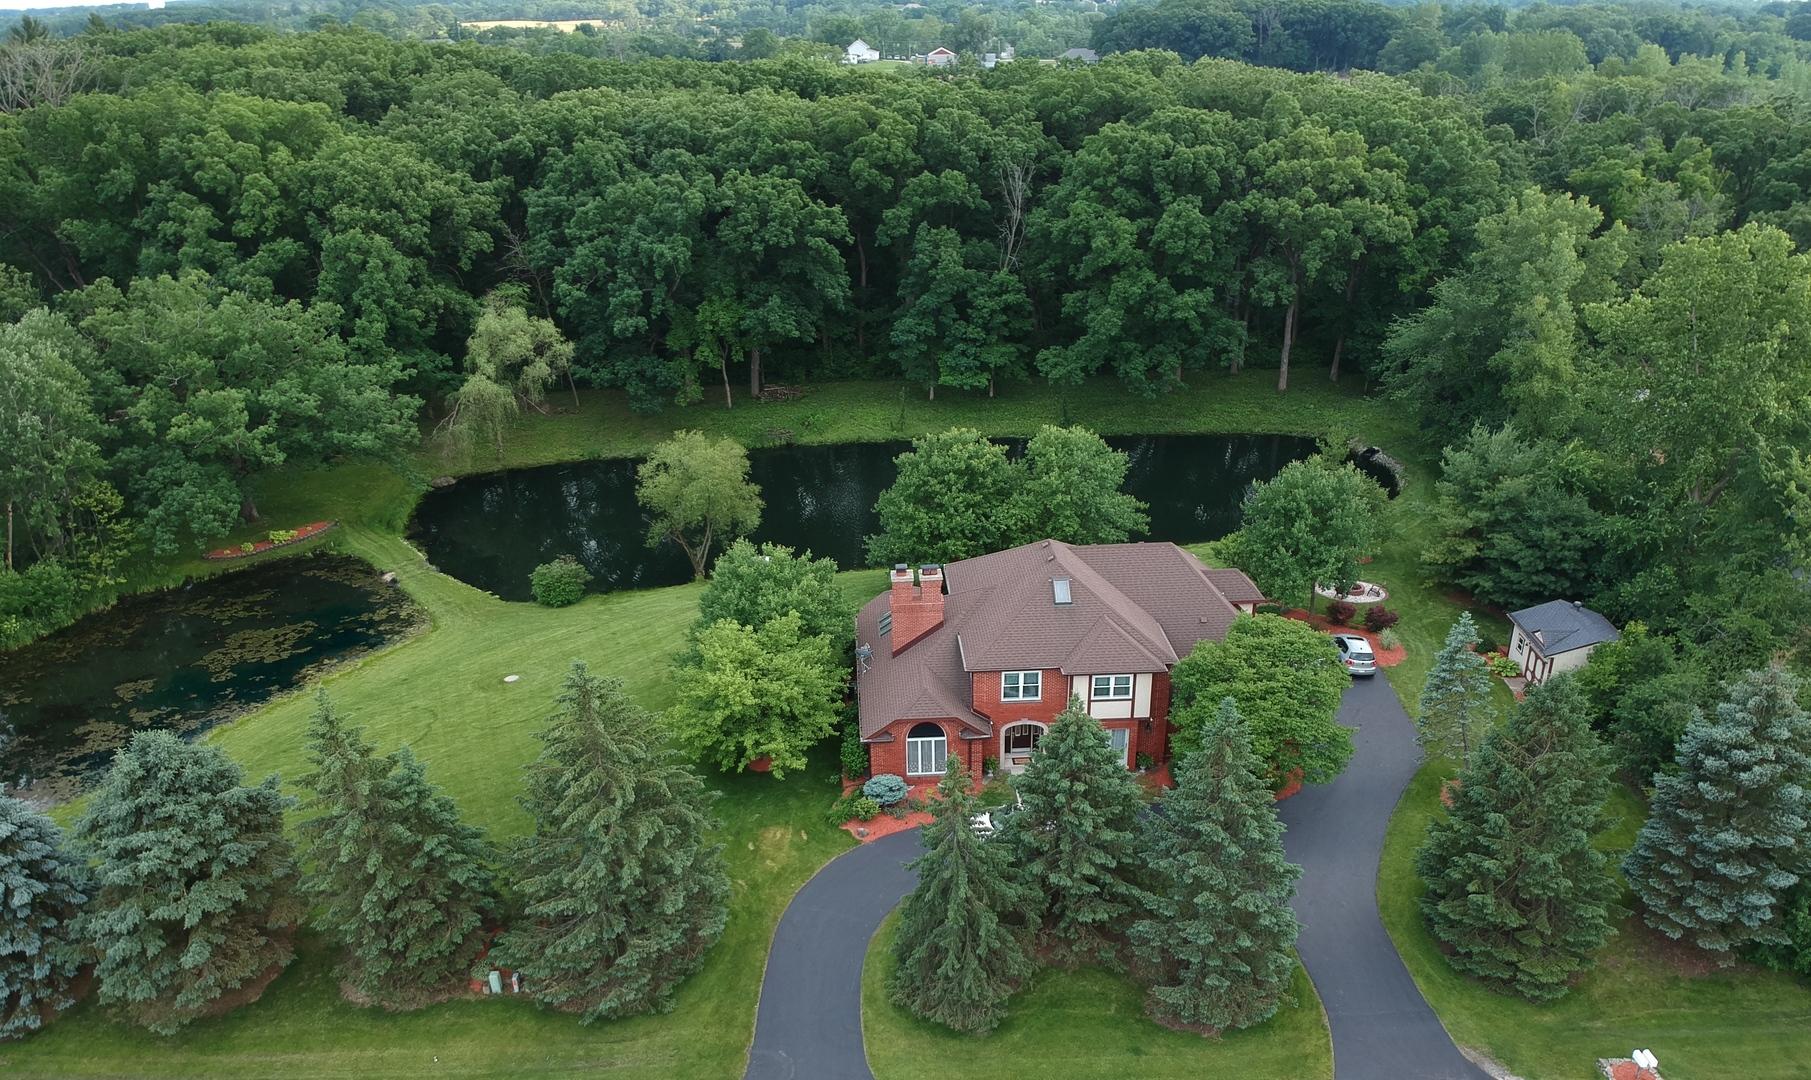 15505 West Thornwood, Homer Glen, Illinois, 60491